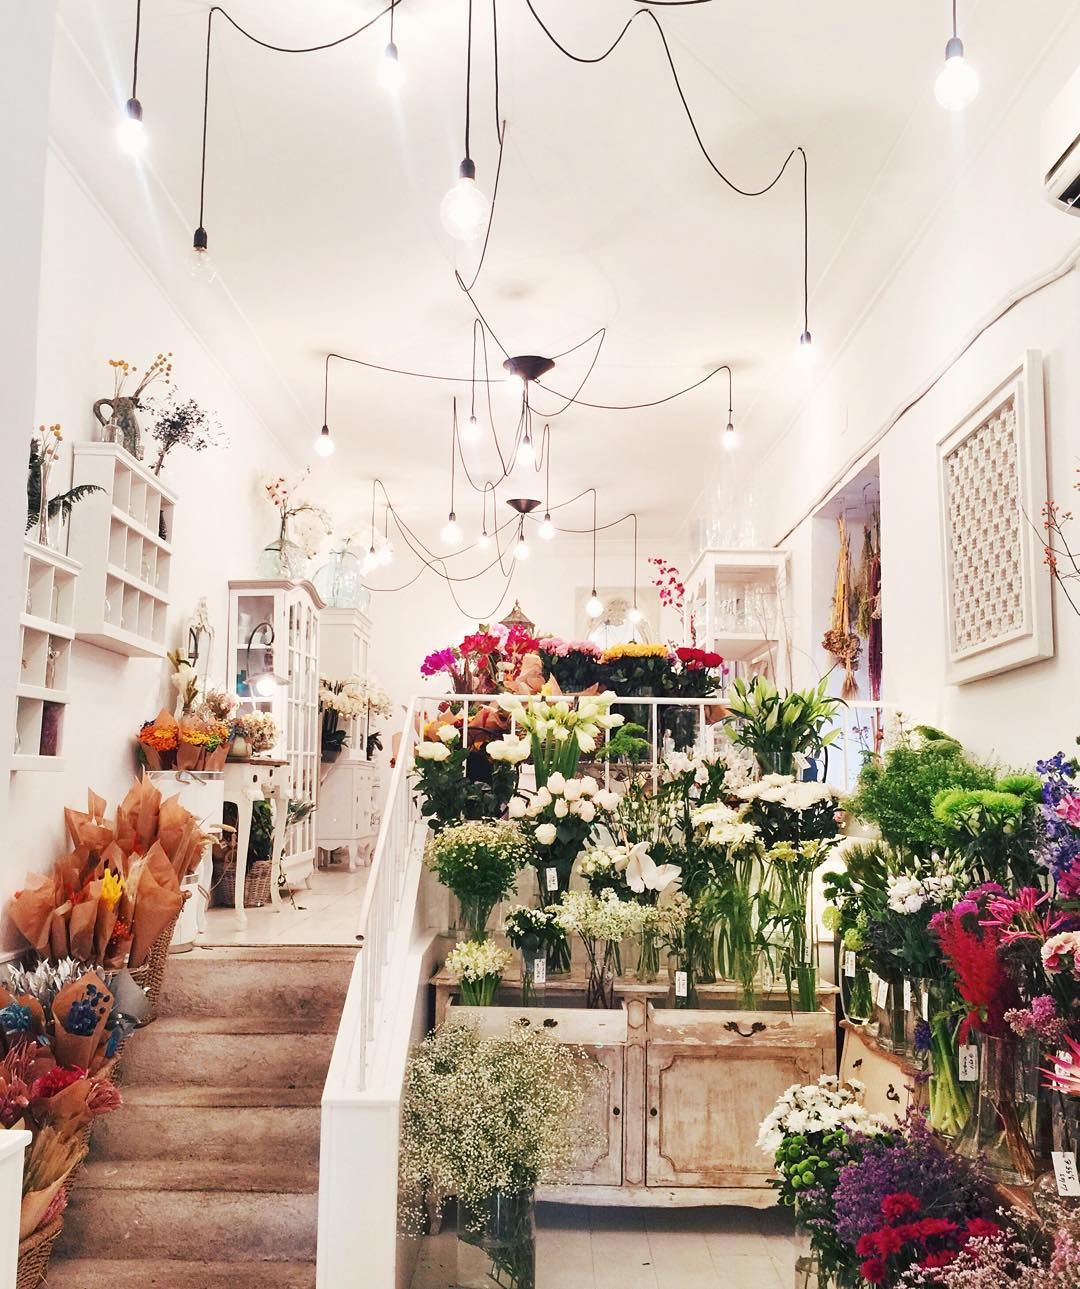 stylishblogger Flower shopping ️ lovelypepa madrid by